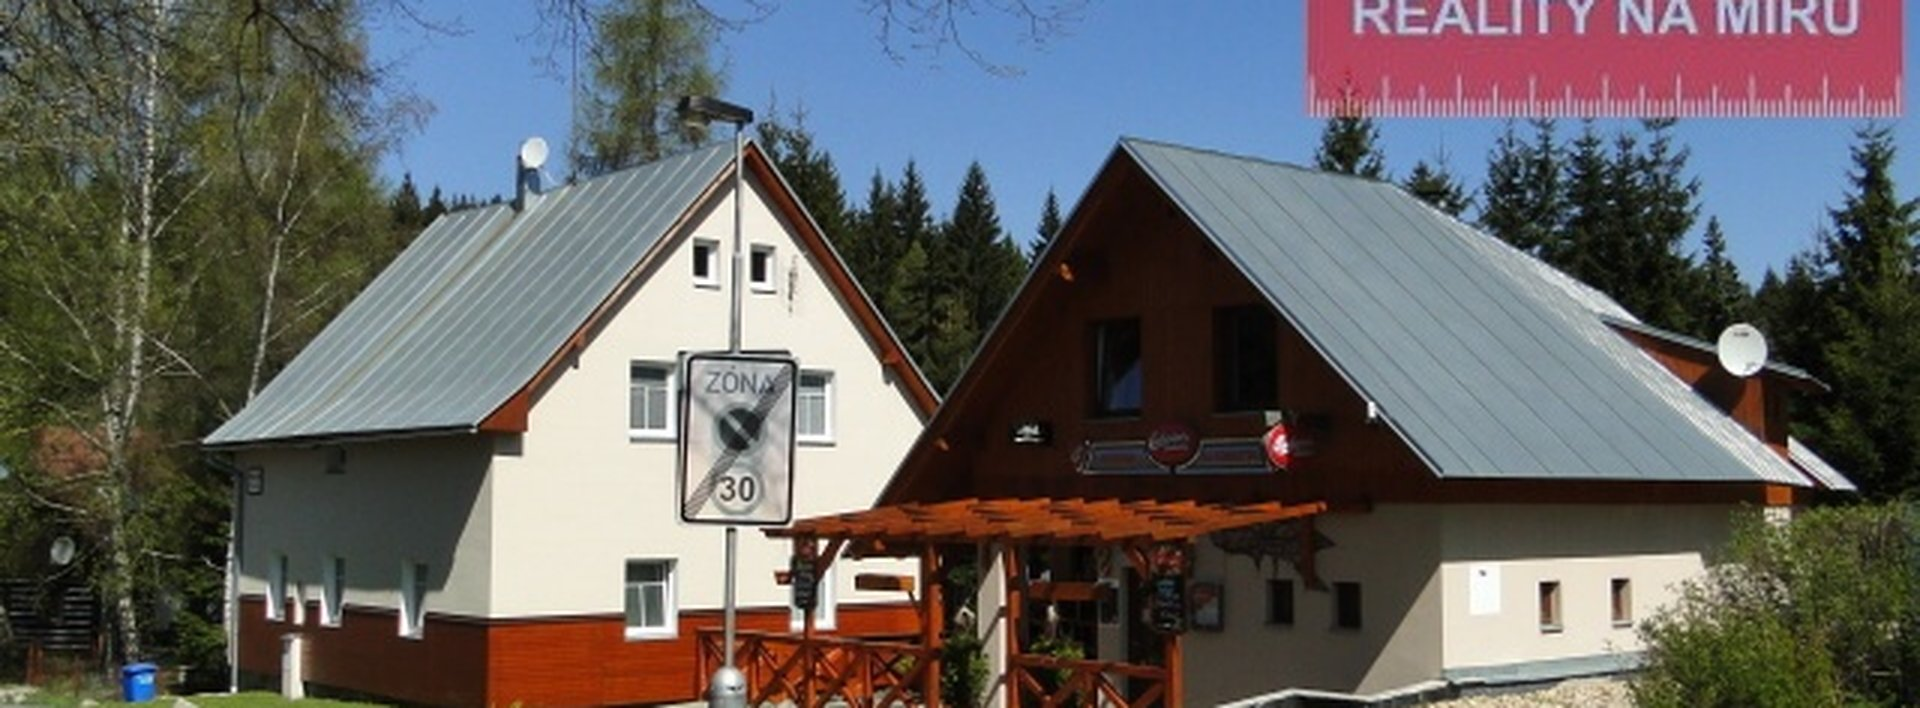 Prodej pizzerie s penzionem ( dva objekty ) Harrachov., Ev.č.: N46128